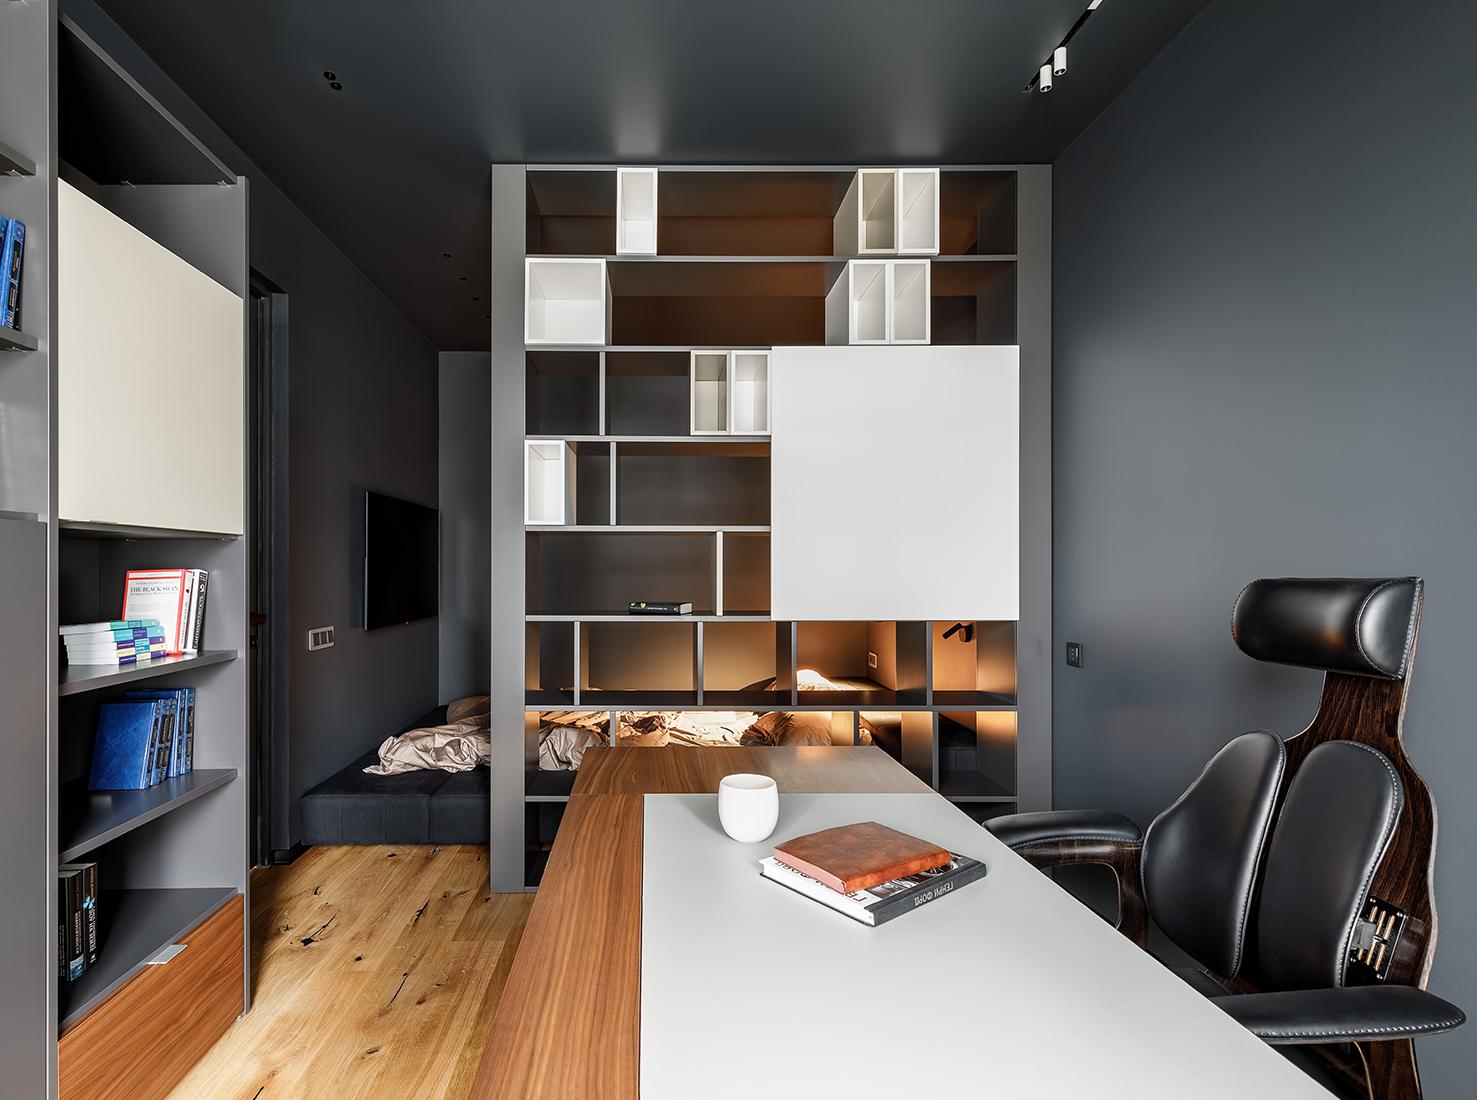 дизайн однокомнатной квартиры фото